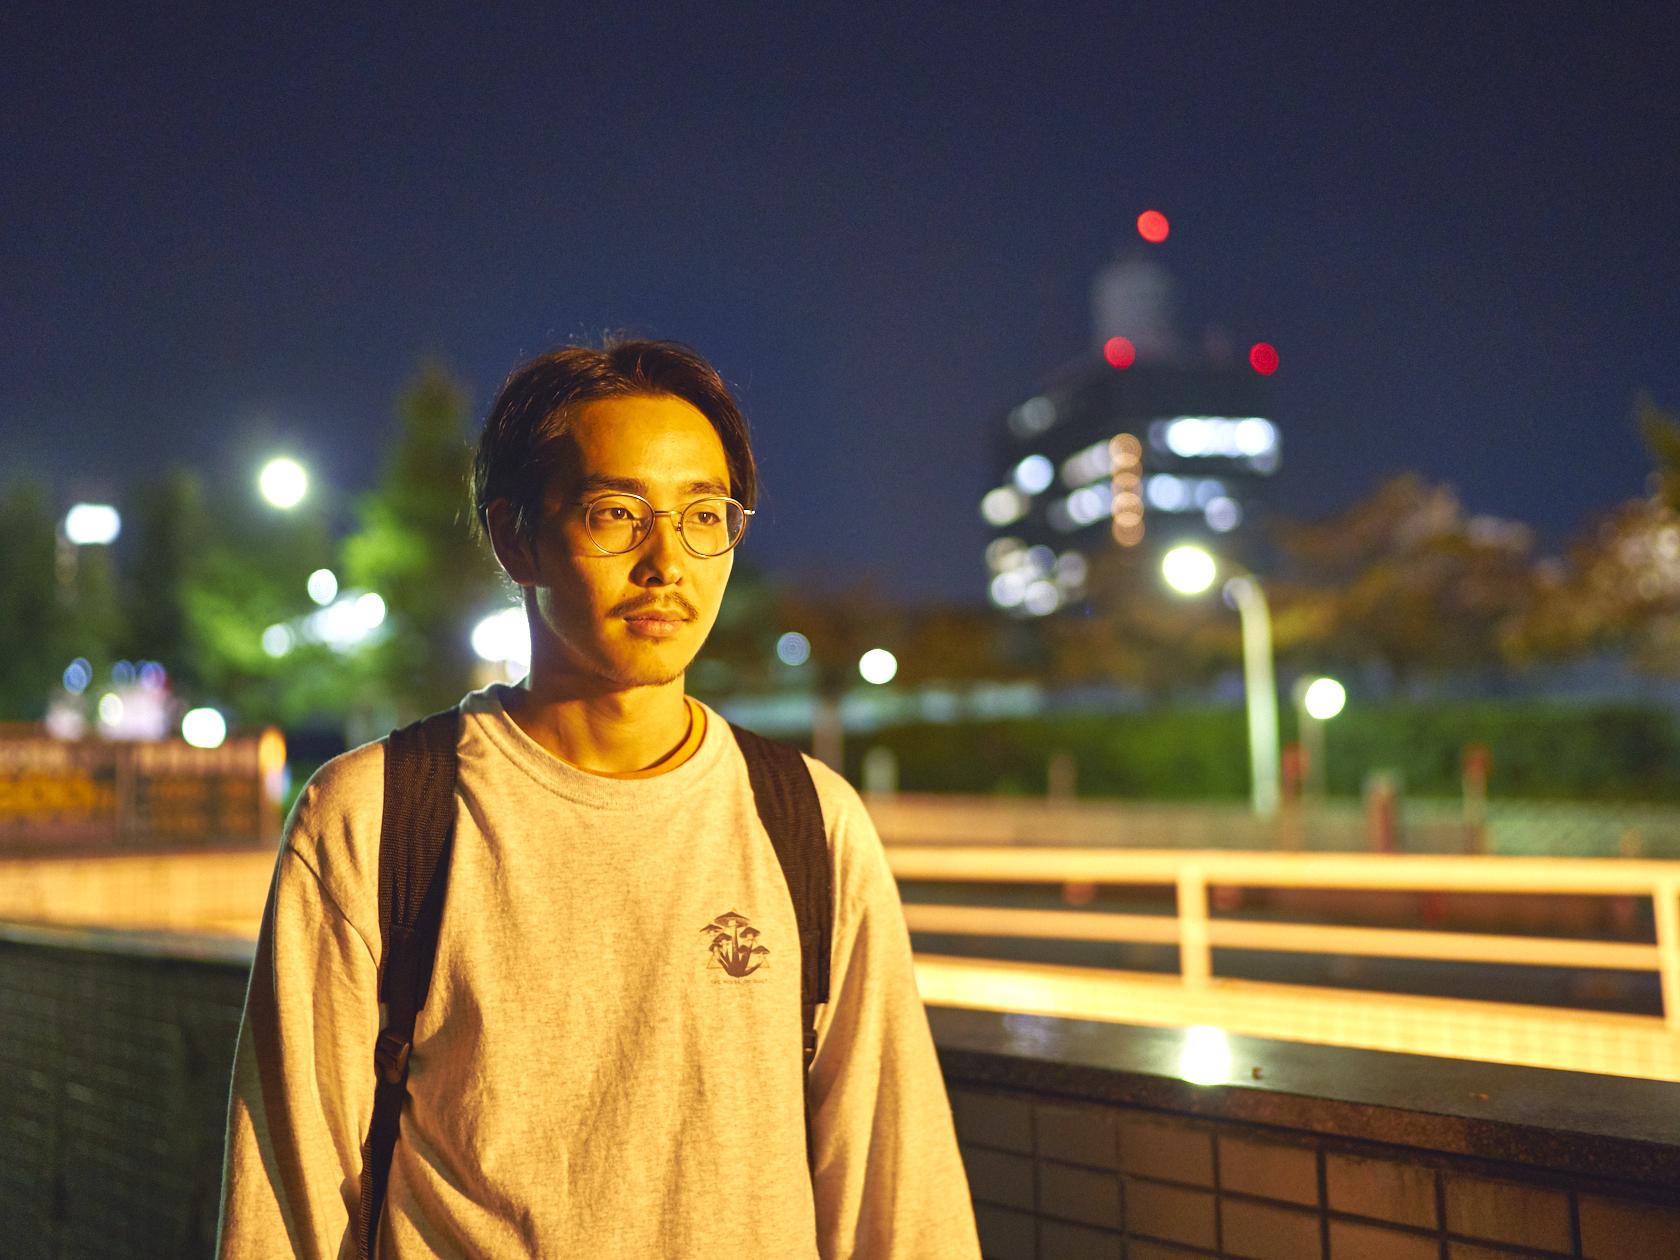 HAKASE - Diaspora Skateboardsの創立メンバー。長野県出身。現在は拠点を東京に移しDiaspora Skateboardsとして活動中。渋谷区・神南にあるMORTARのショップスタッフでもある。オフィシャルサイトhttp://diasporaskateboards.com/Instagram/ Twitter